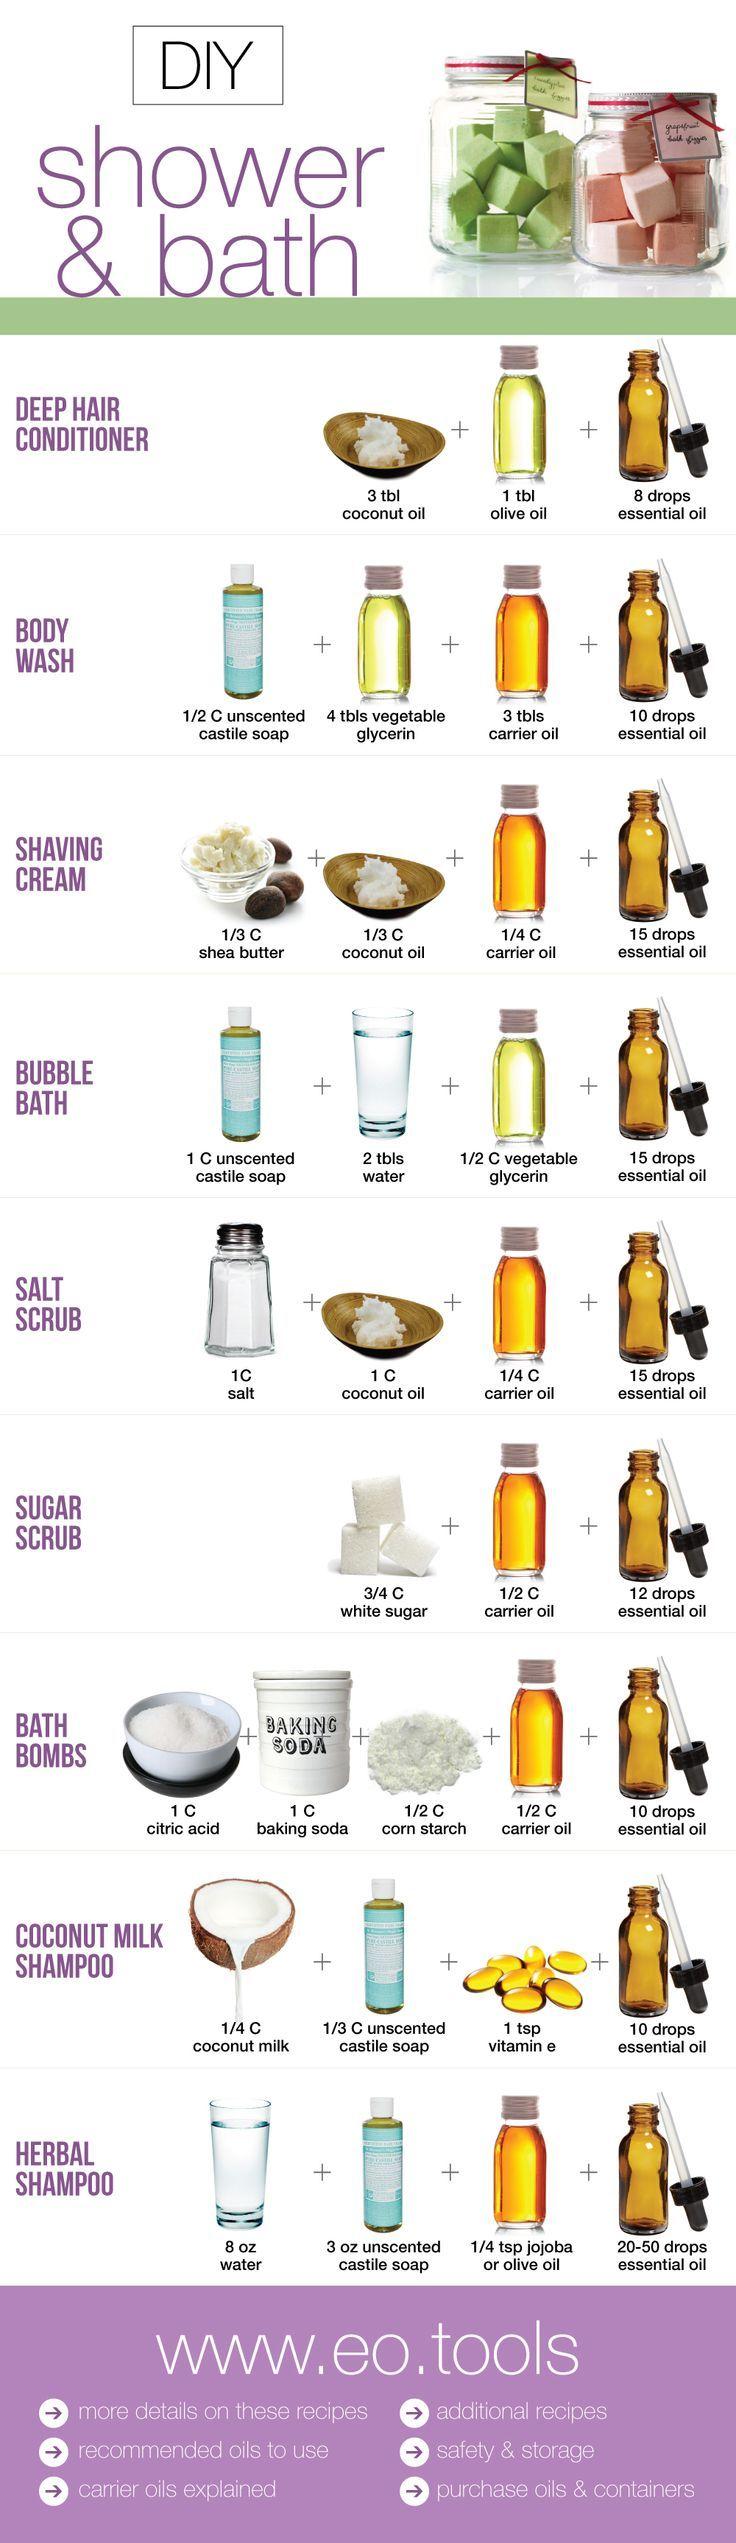 Published by: http://EoUsageGuide.com TIPS FOR: diy spa recipes, diy bath recipes, diy spa treatment recipes